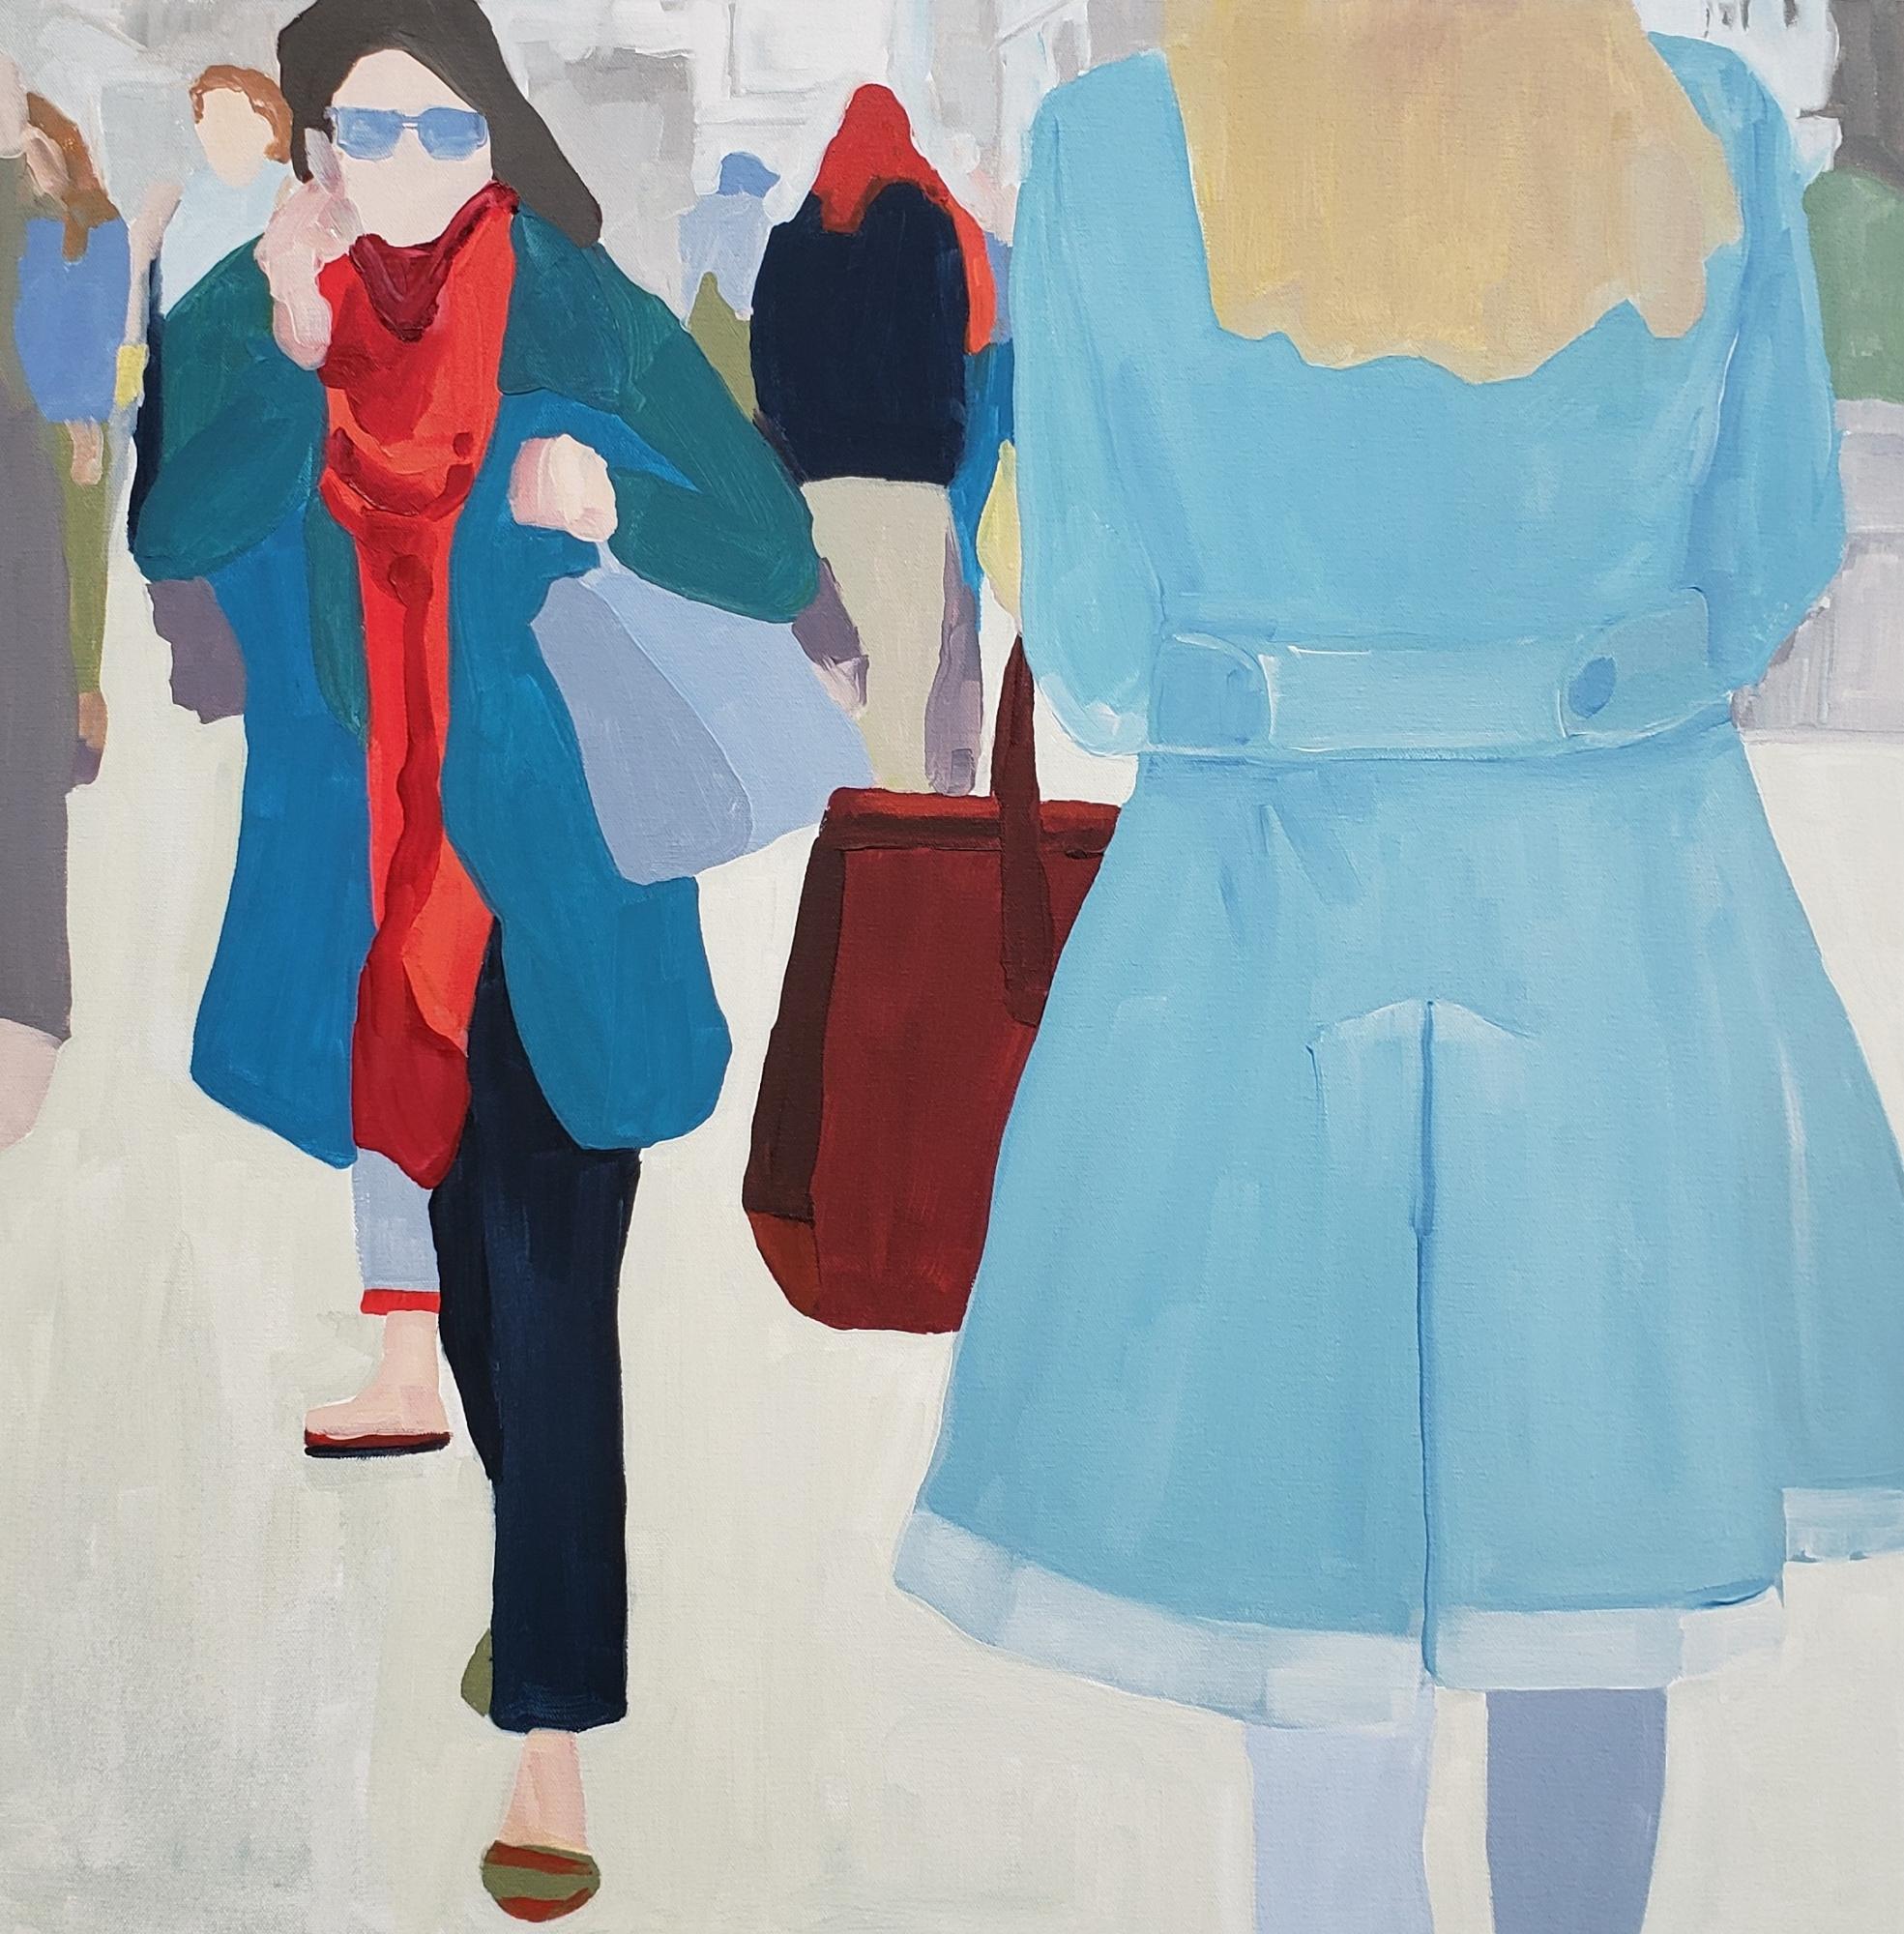 Noon Hour Errands by Sherry  Czekus